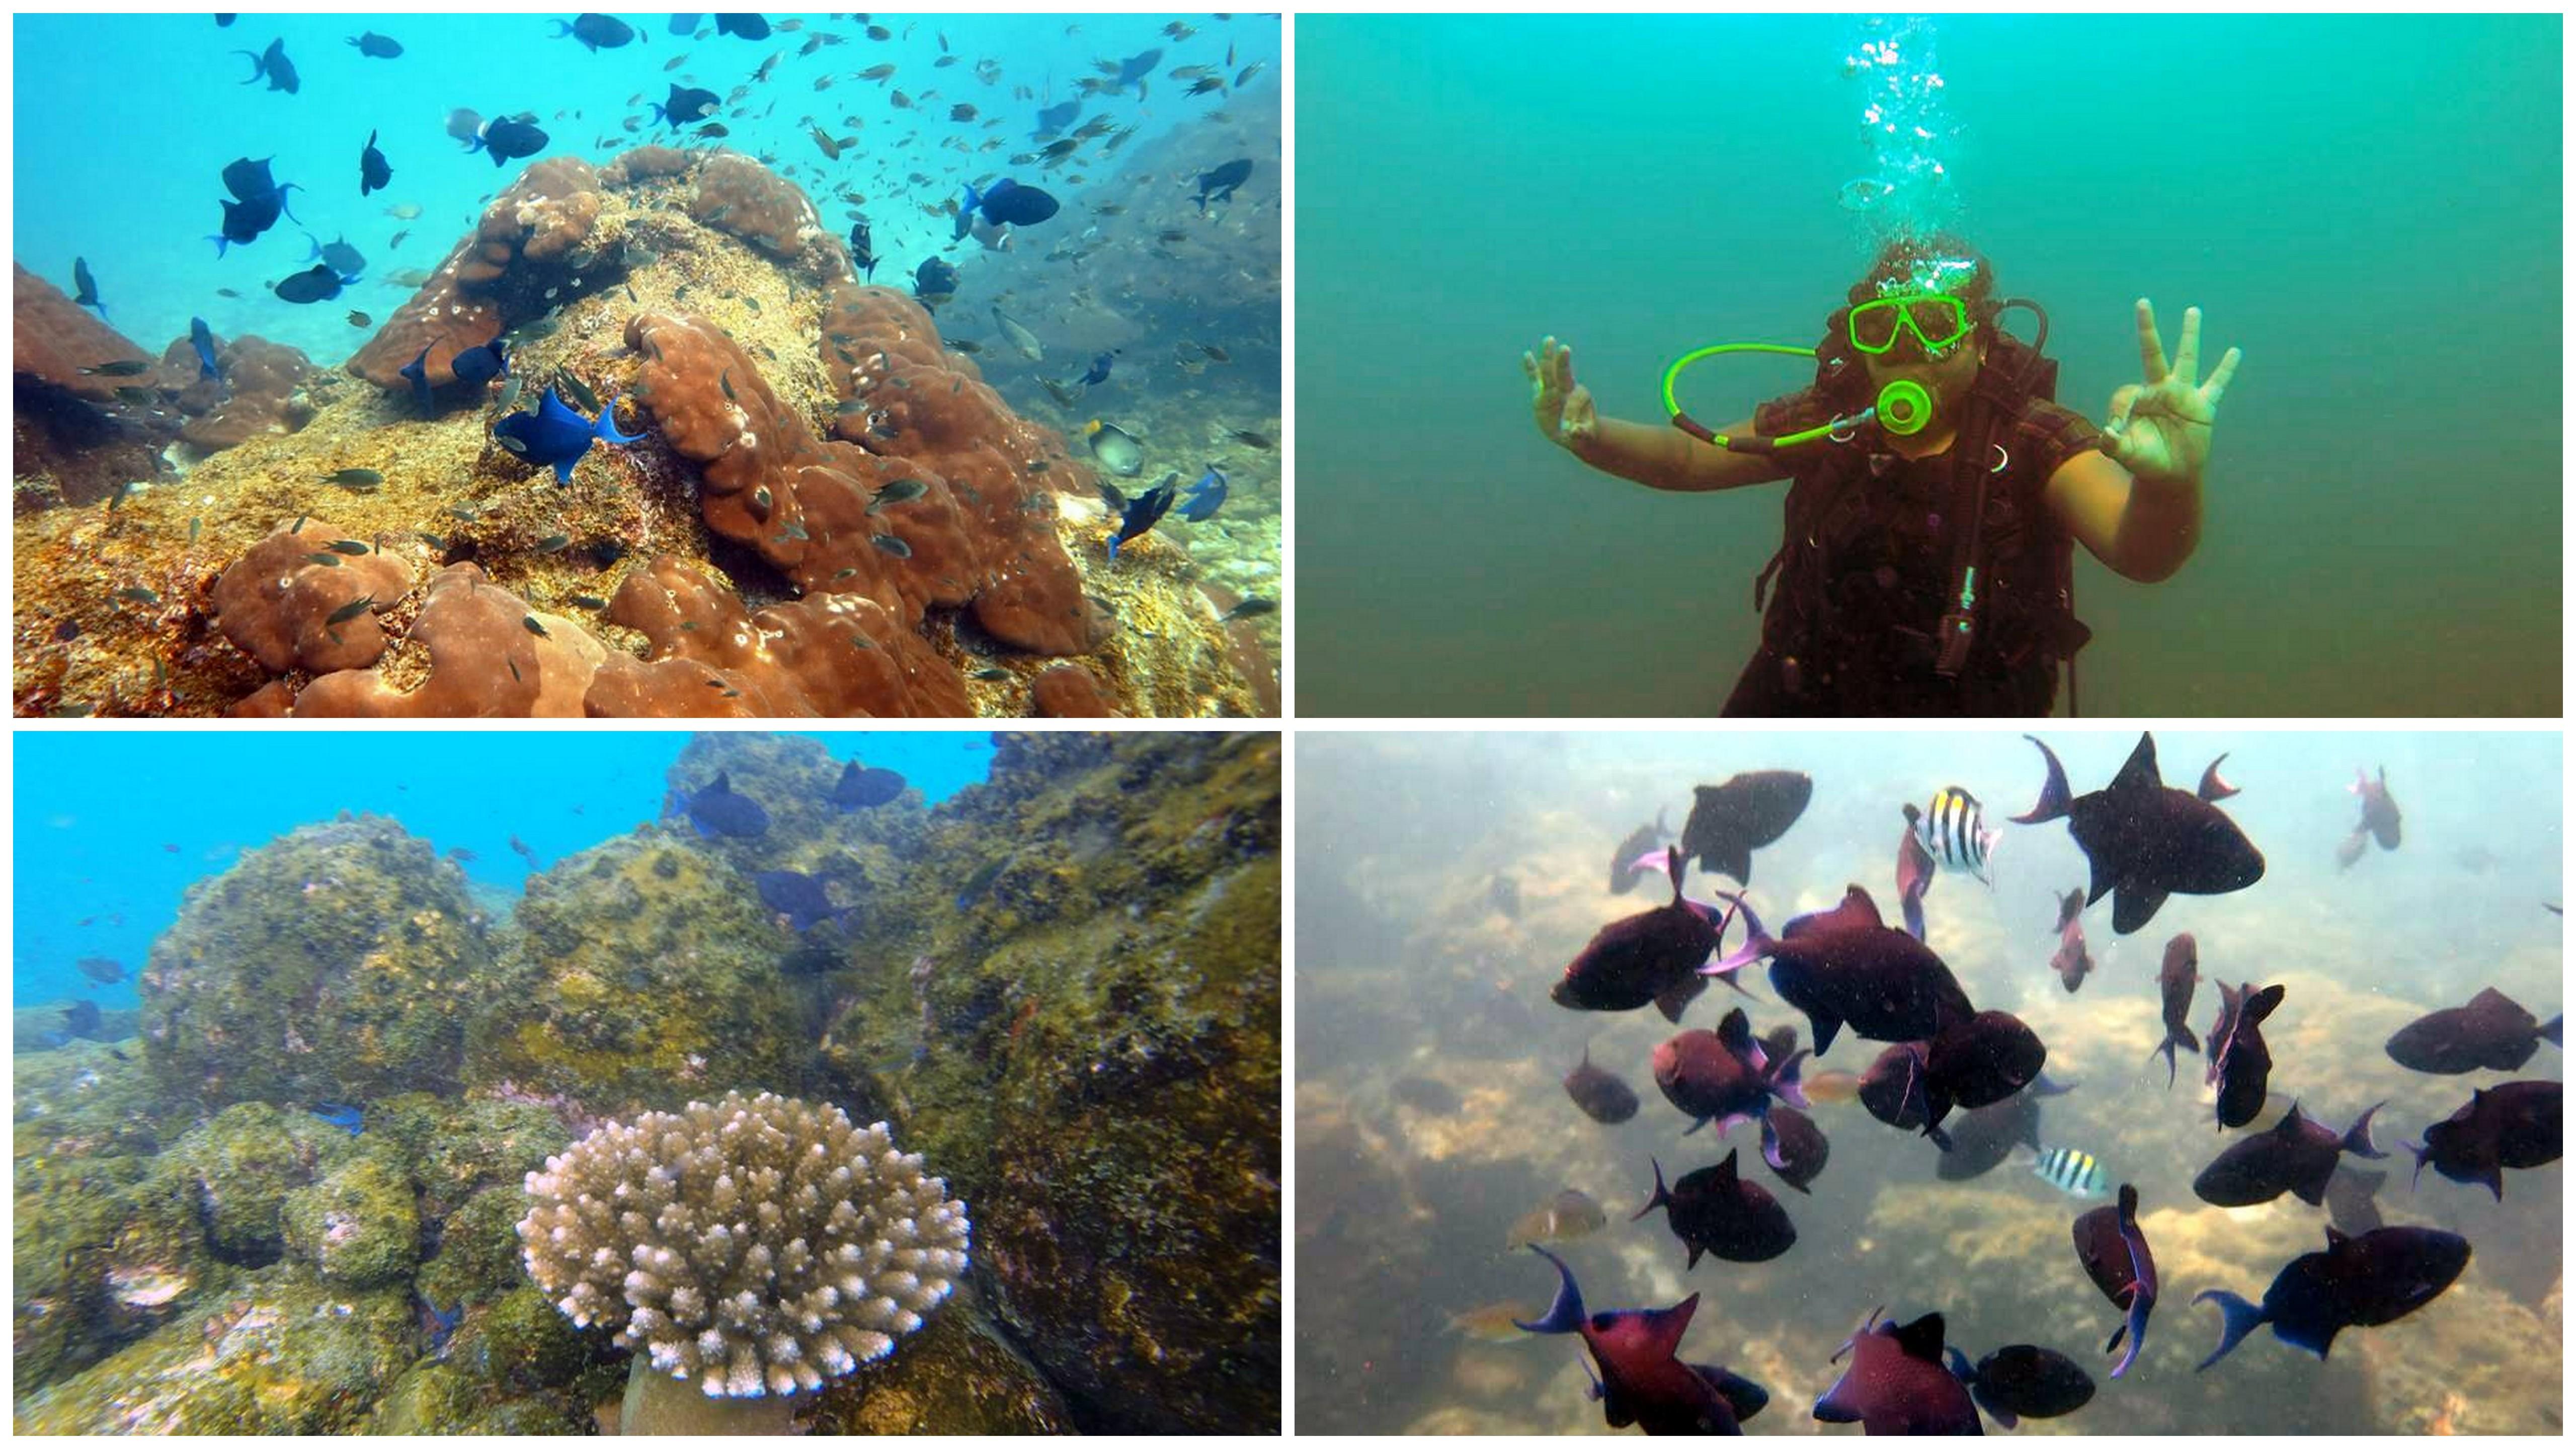 earth day - nethrani islands